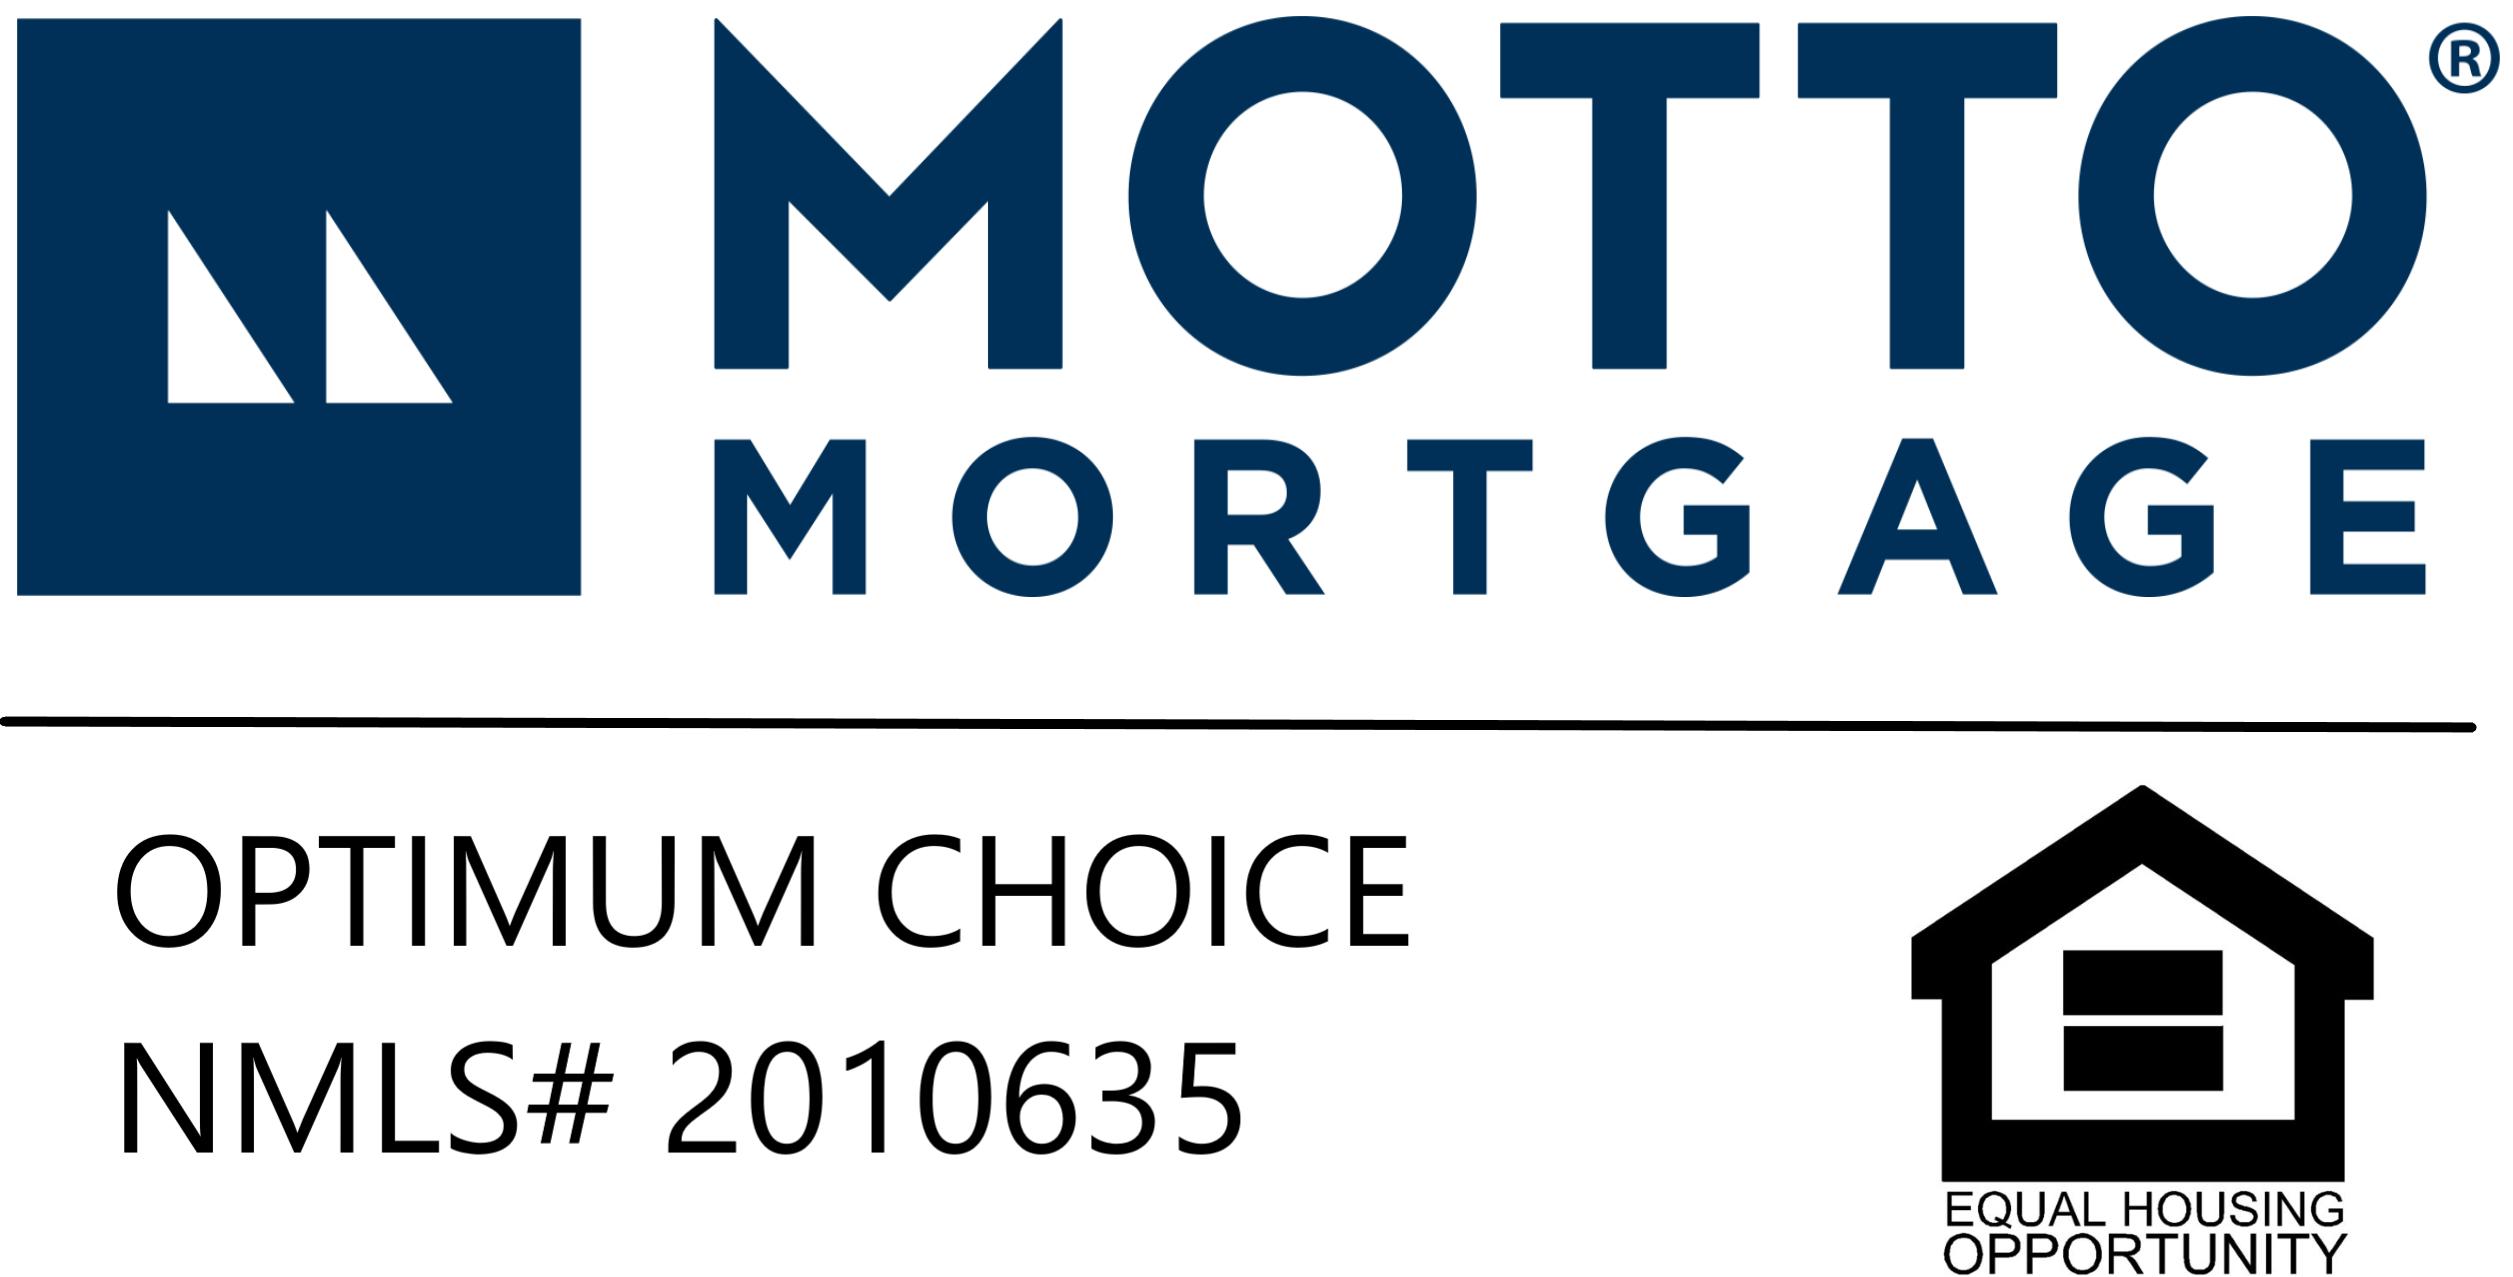 Motto Mortgage Optimum Choice logo